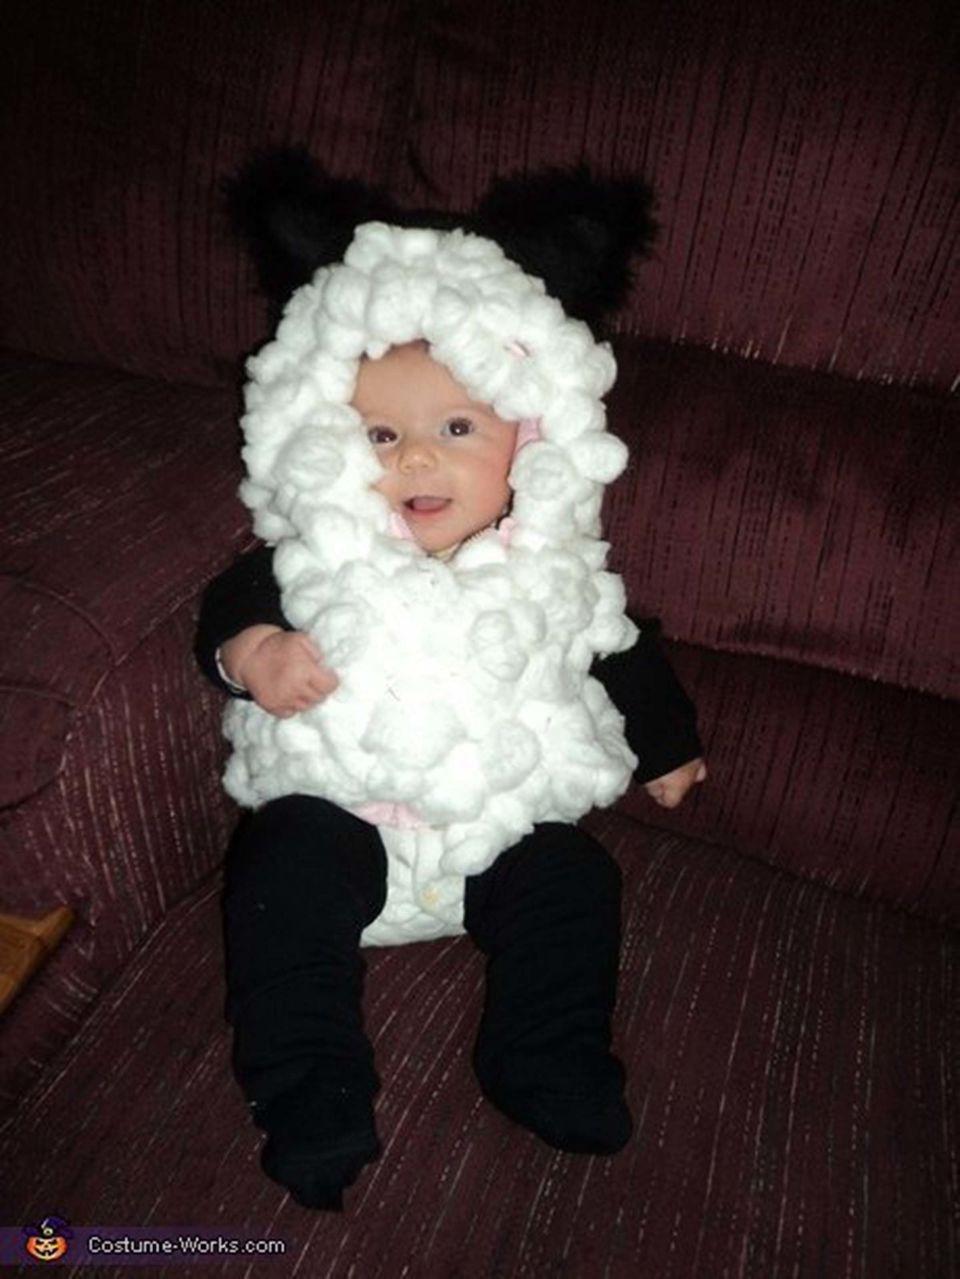 Baby Halloween Costumes Every Human Needs To See Huffpost Life